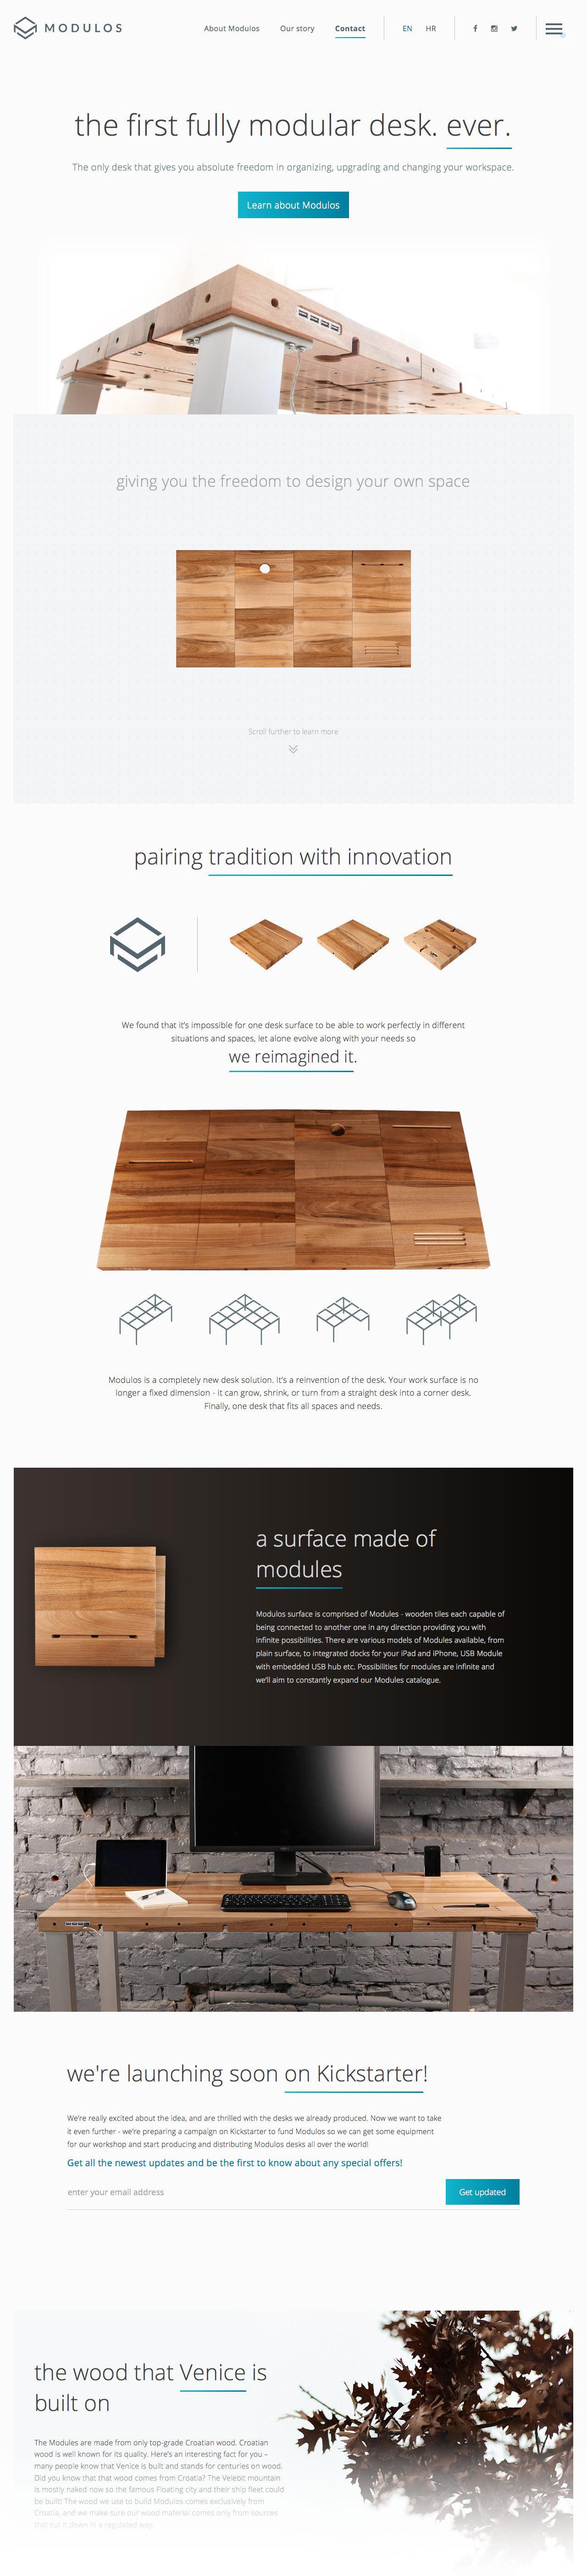 Modulos Desk (More web design inspiration at topdesigninspiration.com) #design #web #webdesign #sitedesign #responsive #ux #ui